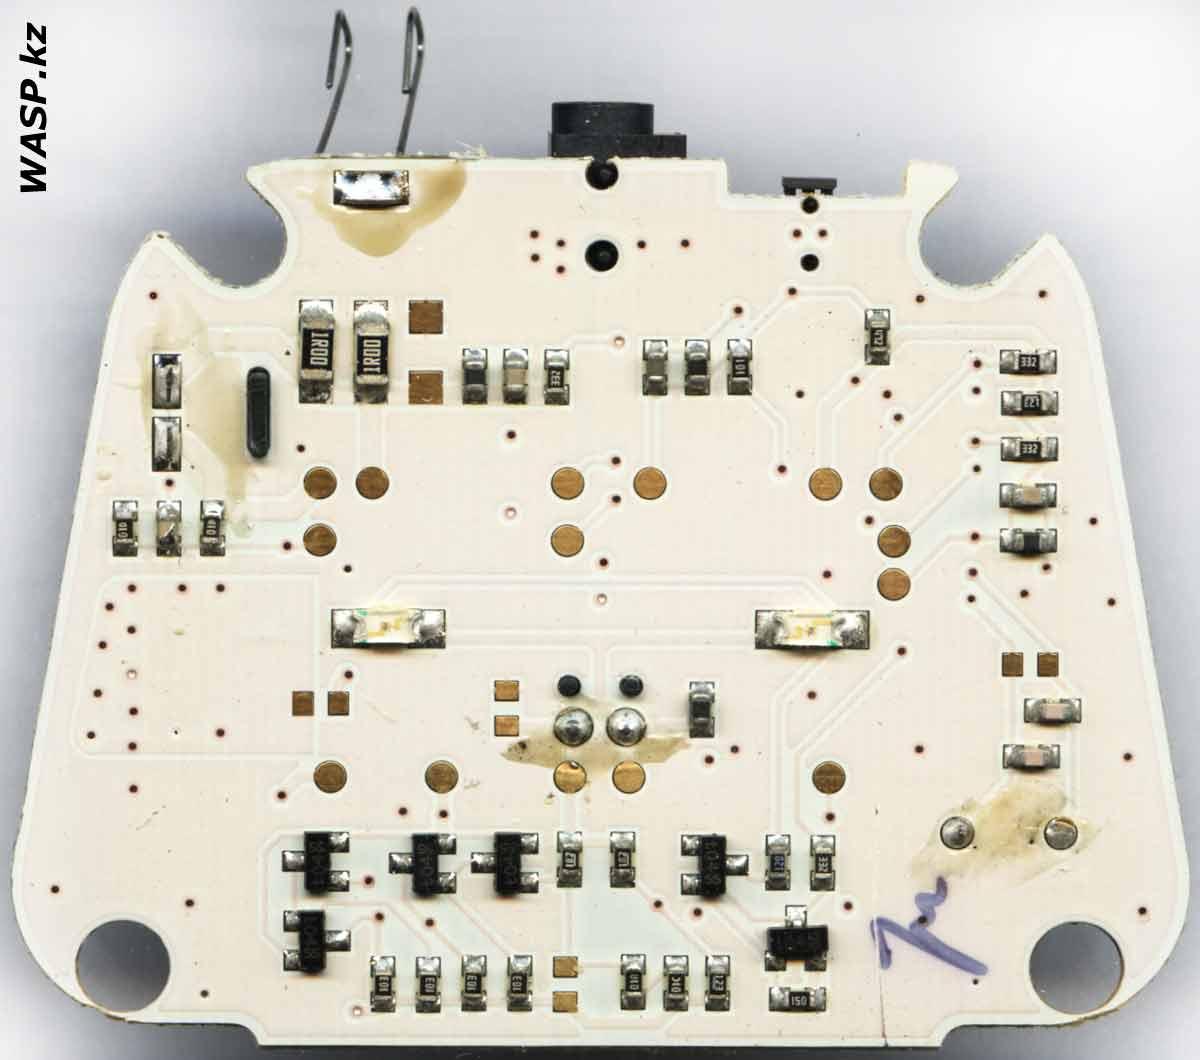 NOKIA DT-12 схема платы электроники